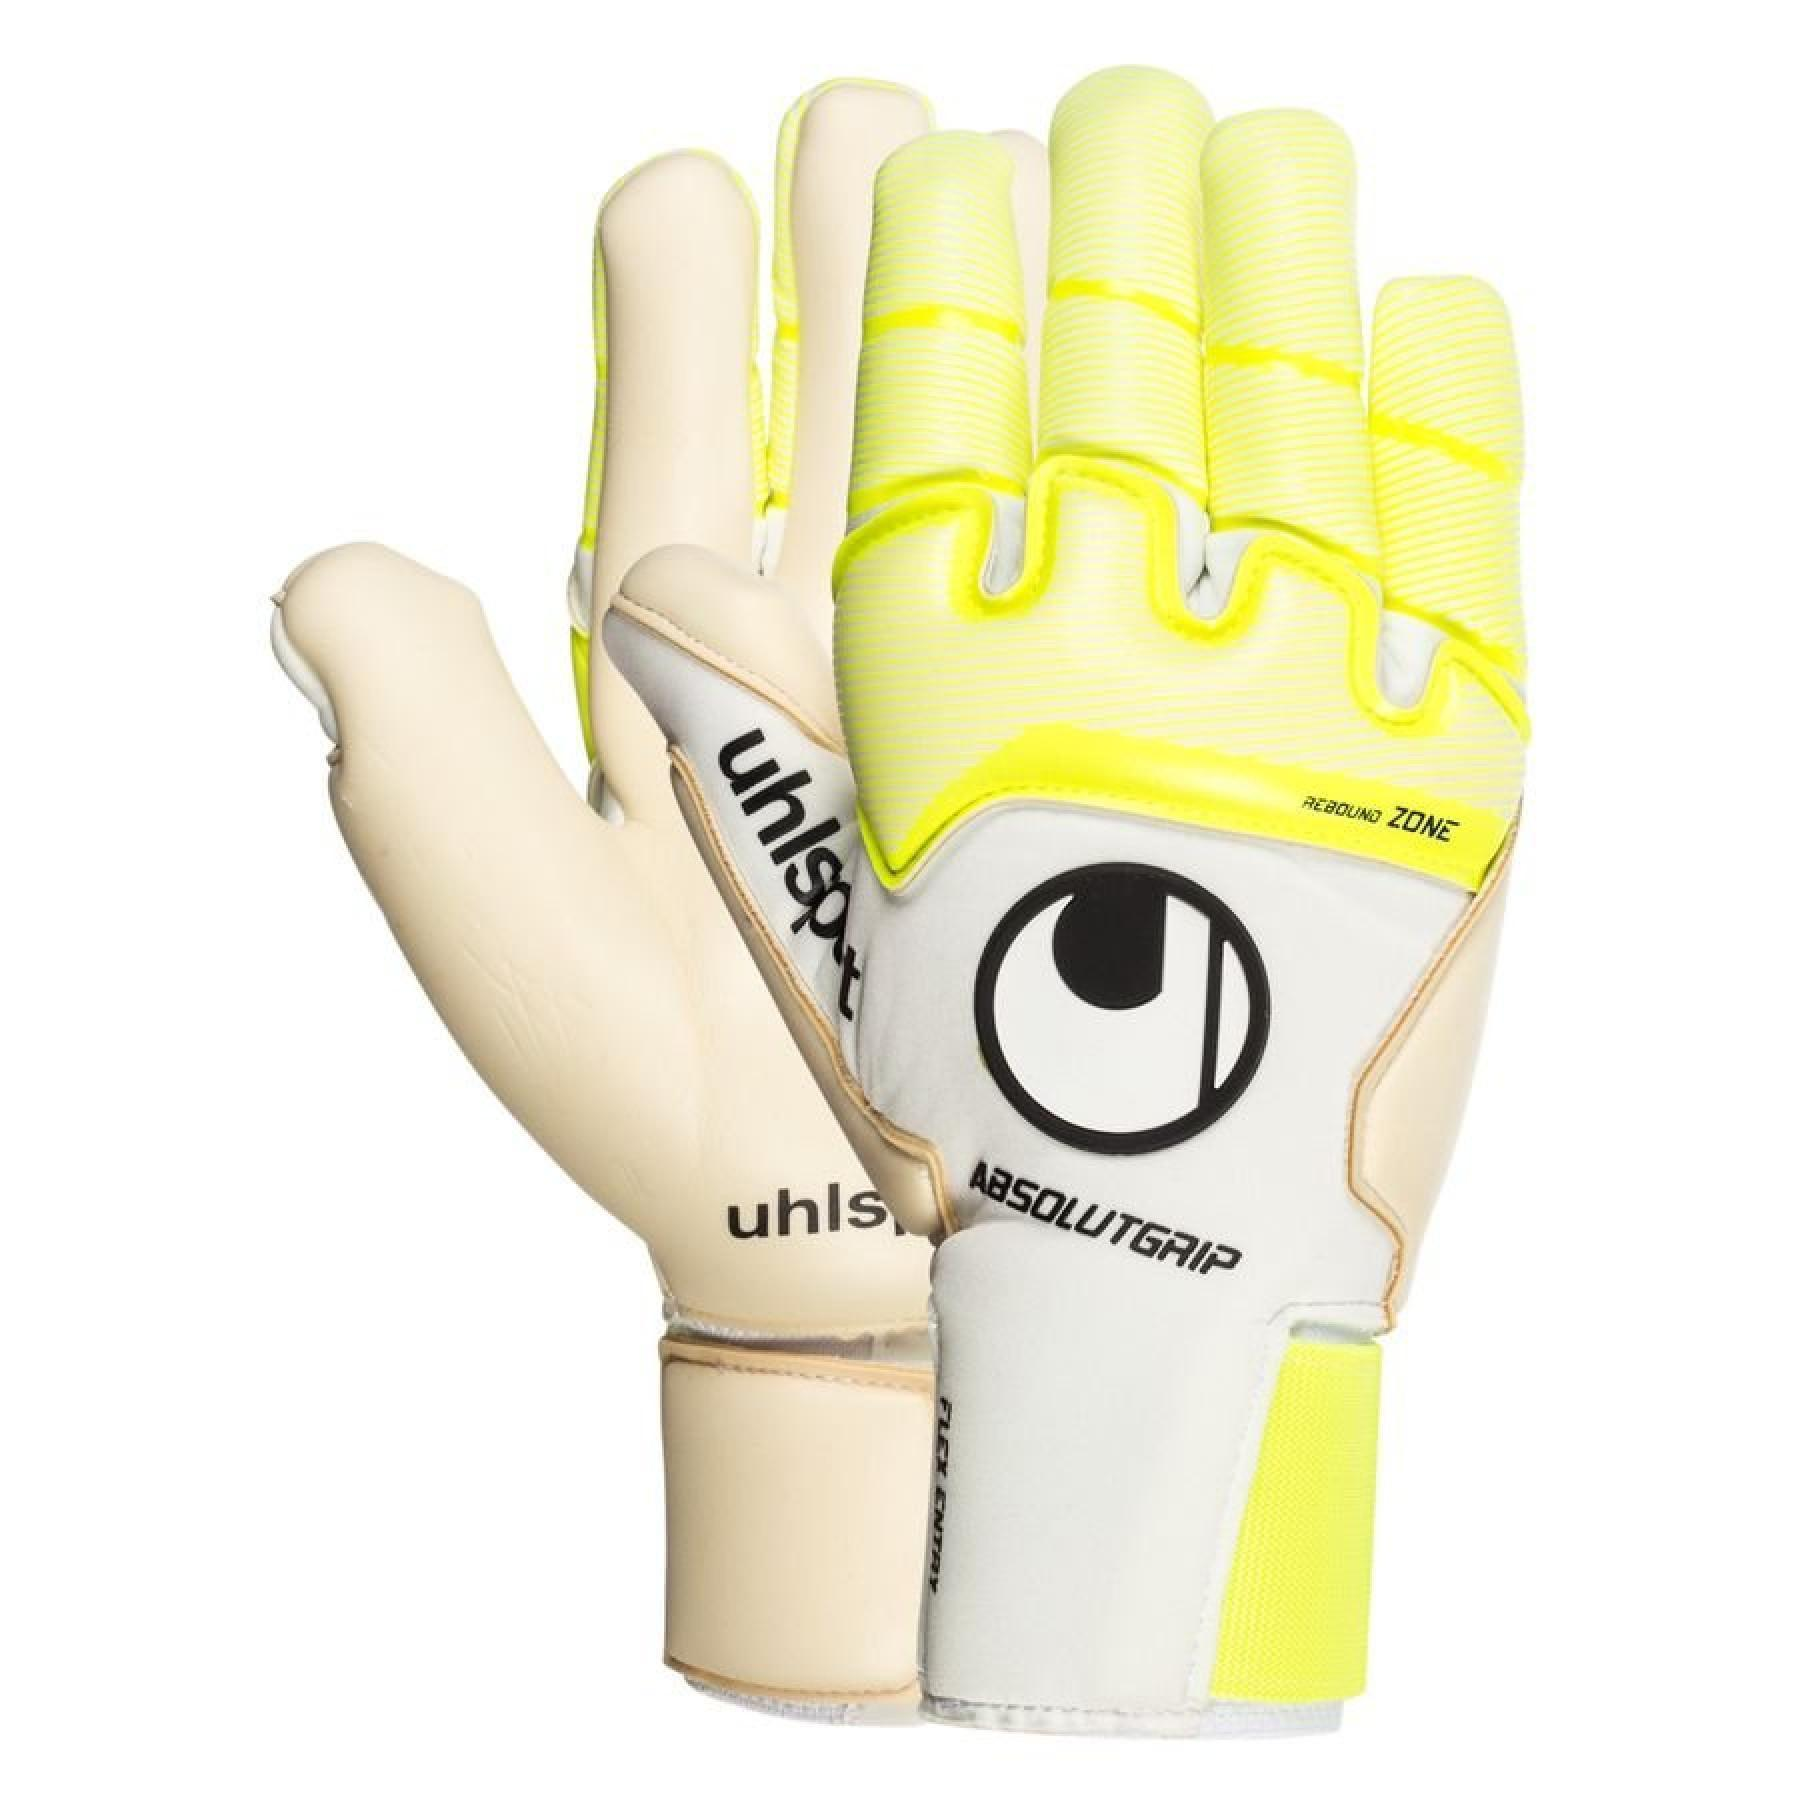 Uhlsport Pure Alliance AbsolutGrip Reflex-Handschuhe